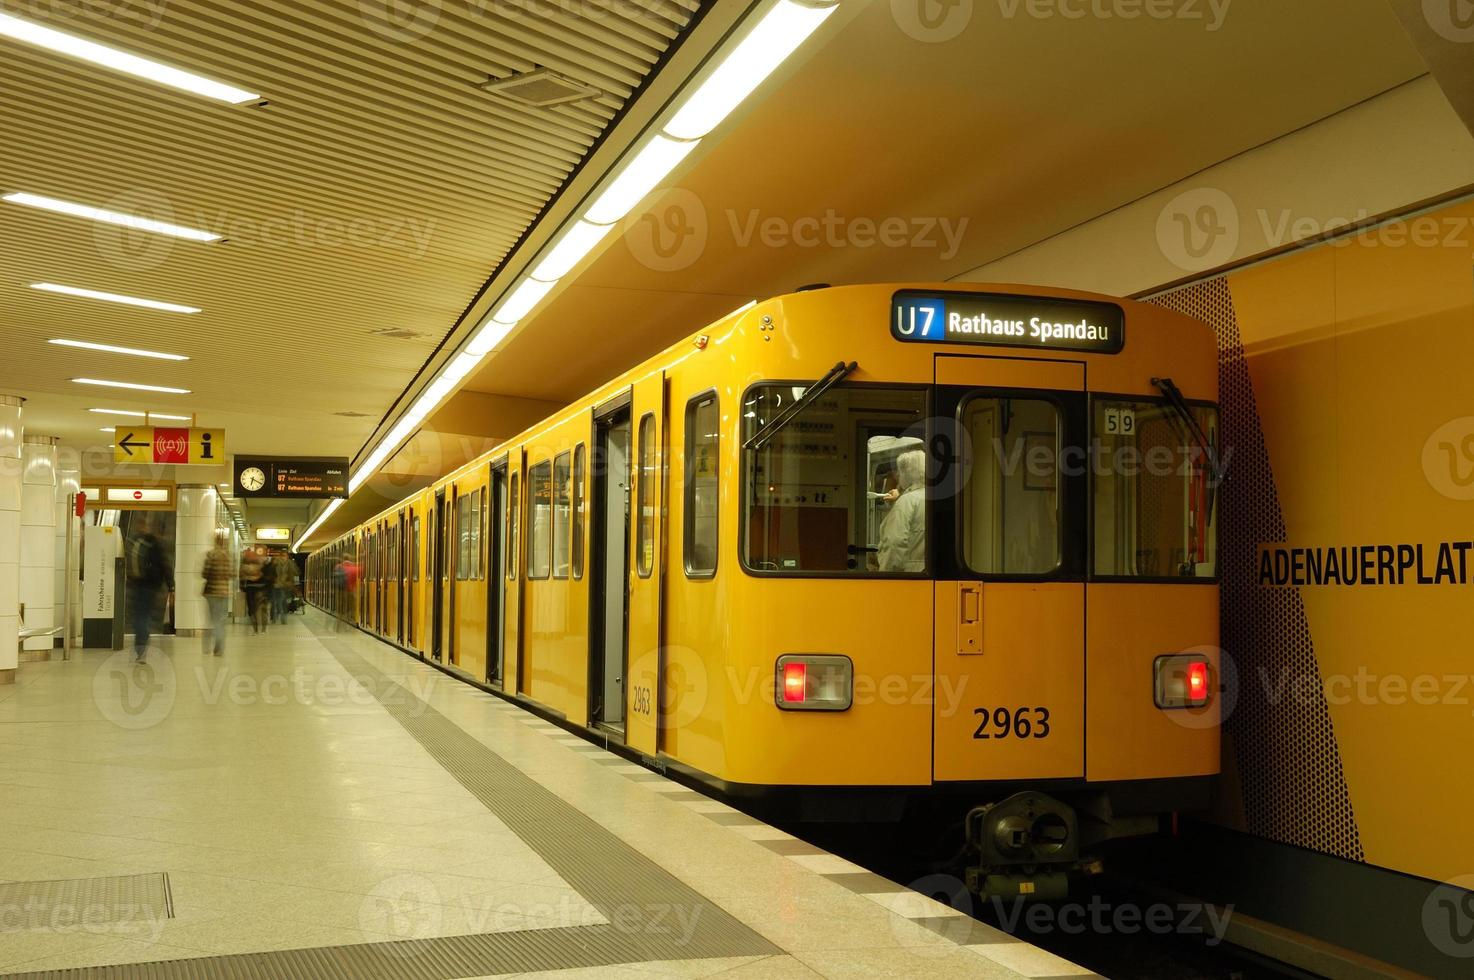 trainen in het metrostation foto